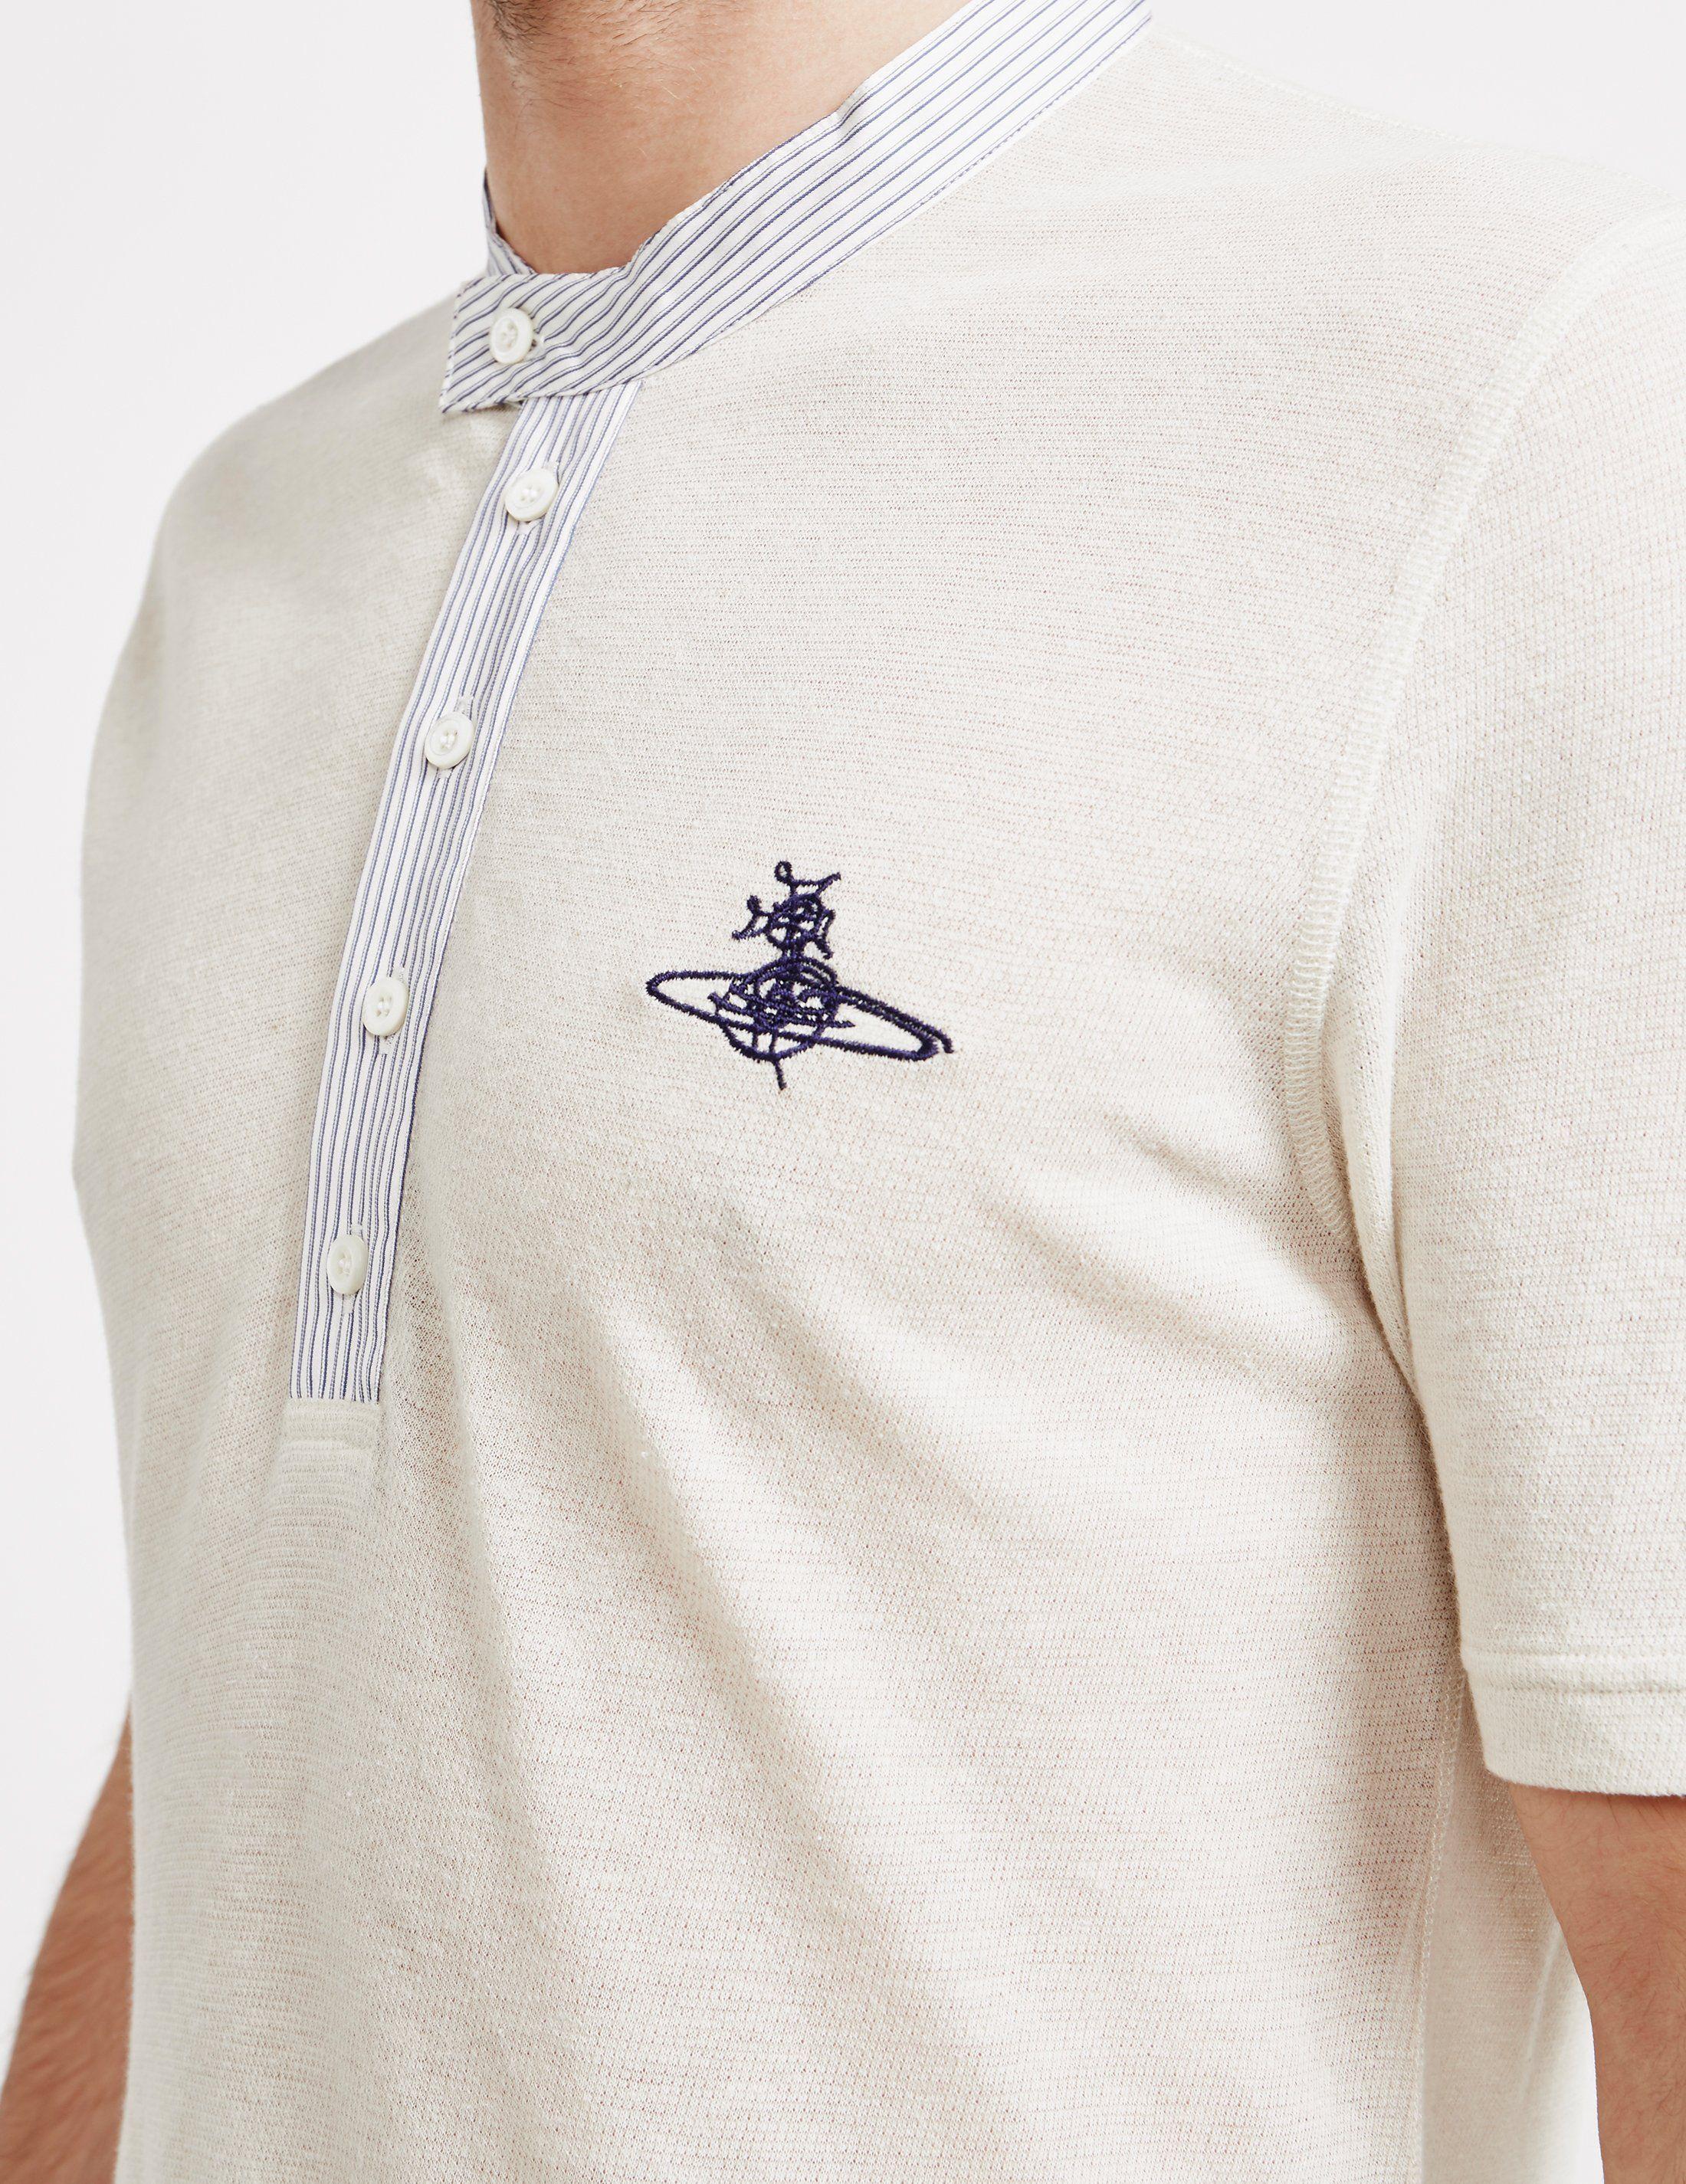 Vivienne Westwood Hemp Short Sleeve Polo Shirt - Online Exclusive